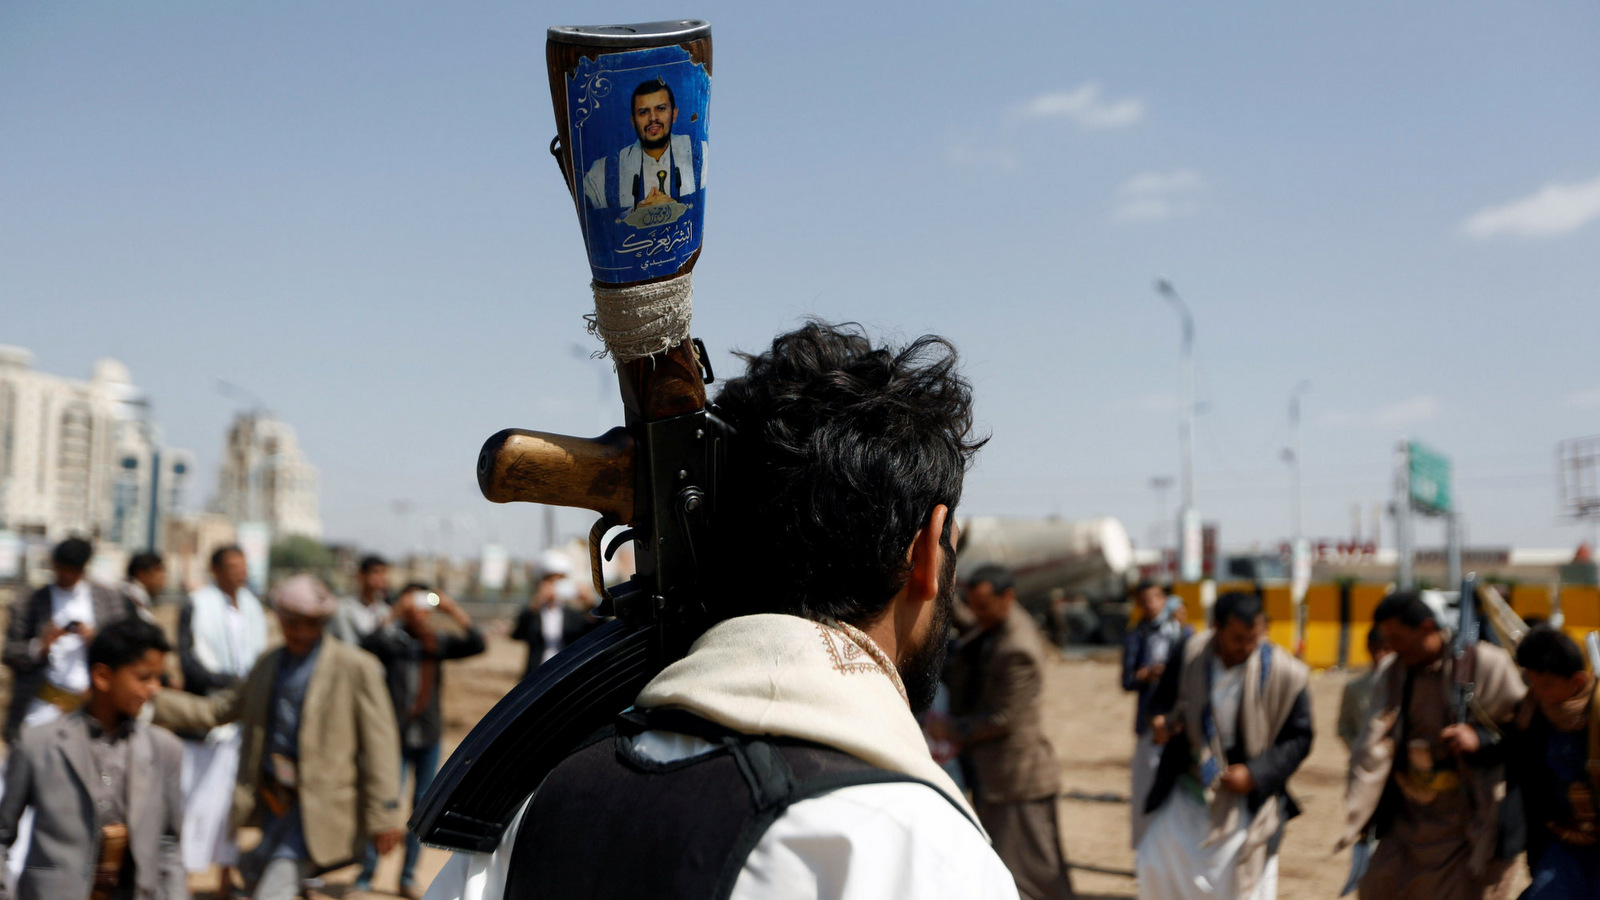 Report From the Battlefields of Hodeida: Yemeni Locals Push Back Amid Saudi Bombs, Mercenaries, Blockade